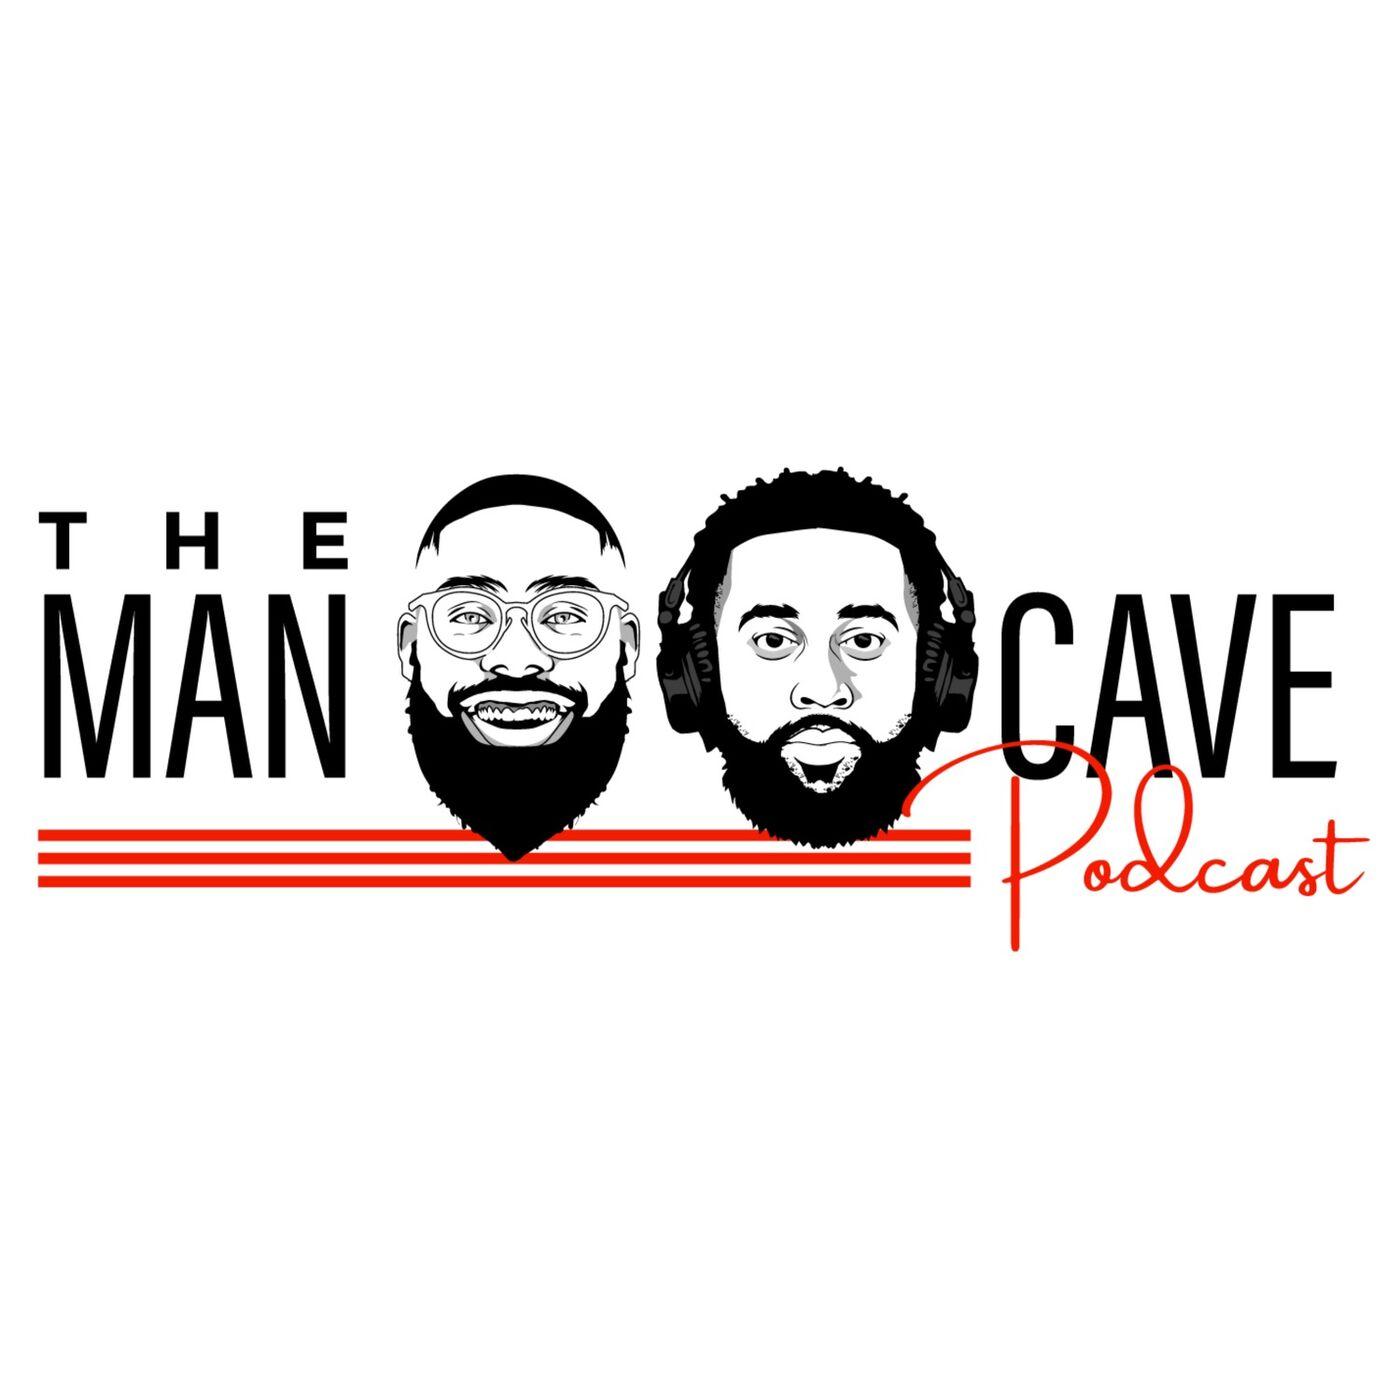 Become A High-Value Man (3 keys)